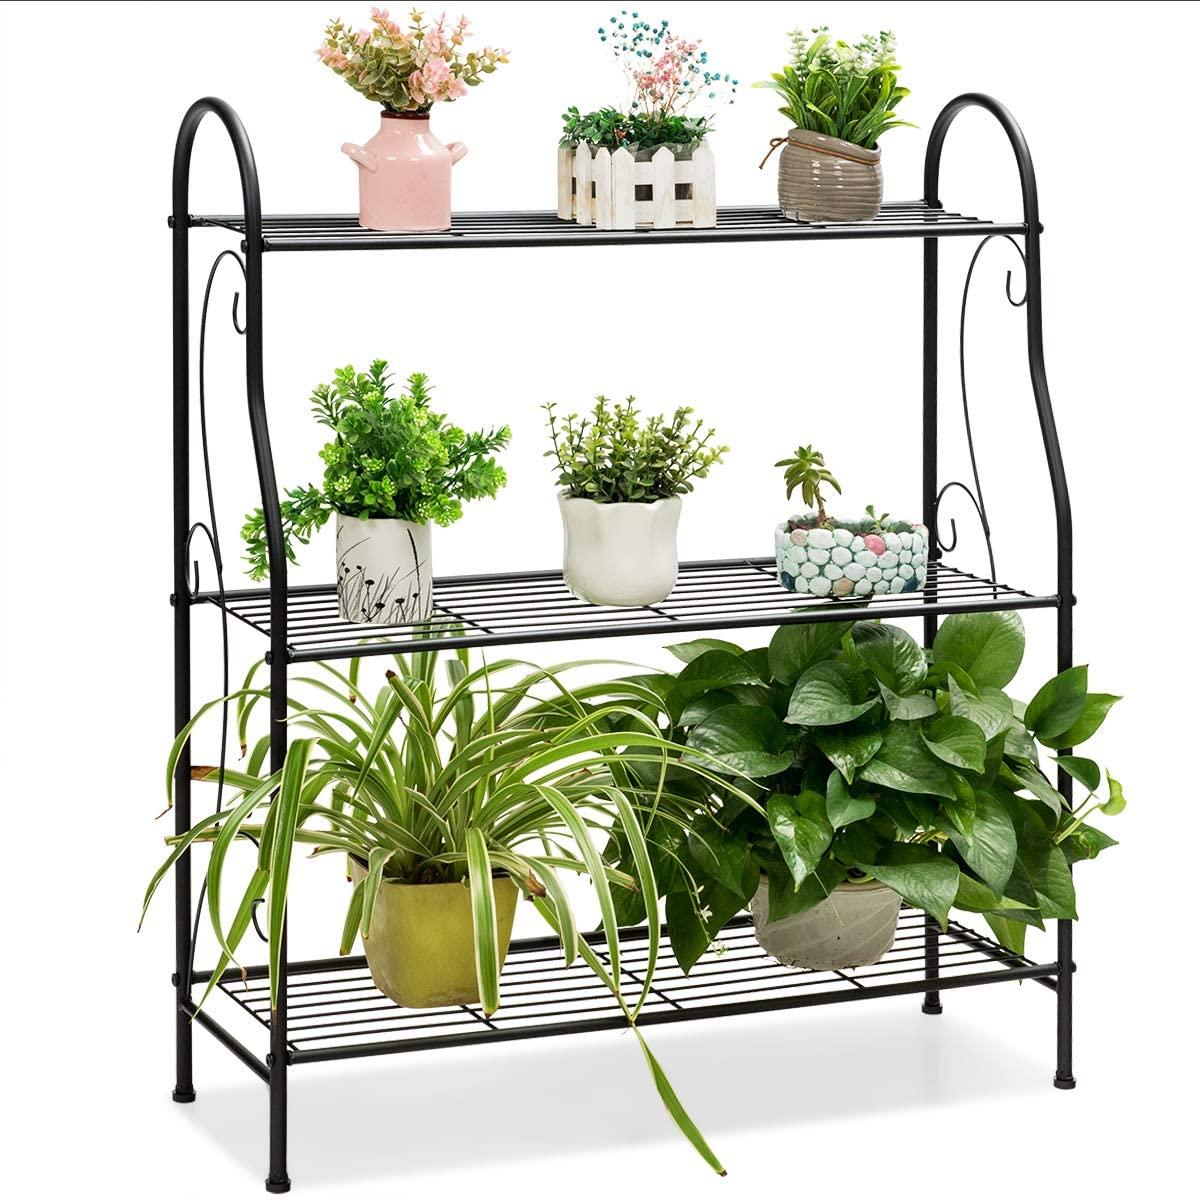 Giantex 3-Tier Metal Plant Stand, Scrollwork Design, Indoor & Outdoor Flower Rack, Multifunctional Home Storage Organizer Shelf, Pot Holder with Built-in Handles (Black)